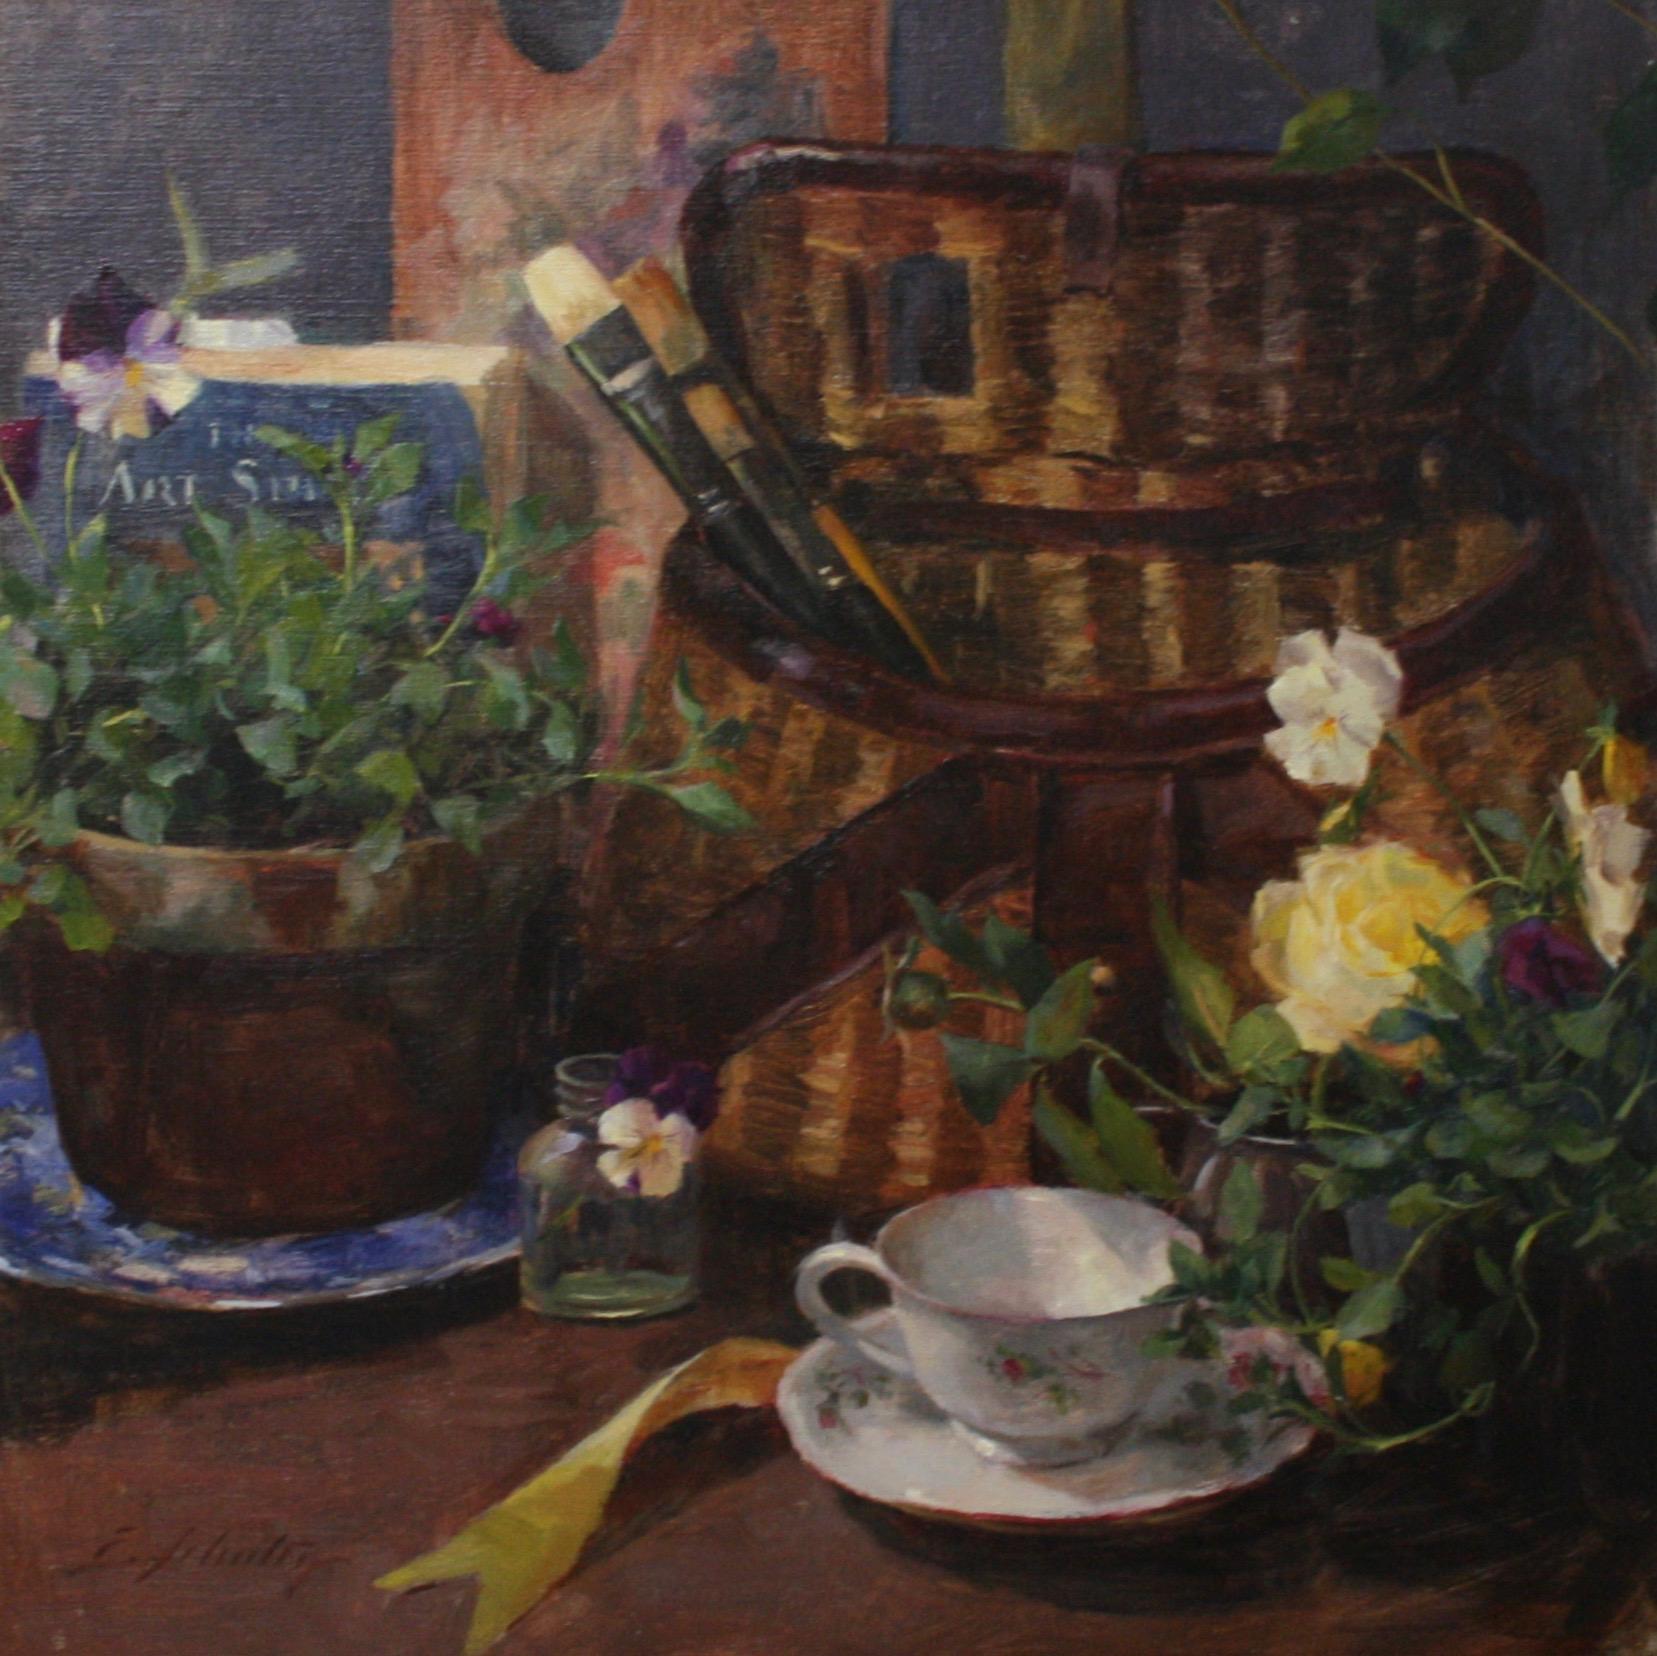 """Artistic Endeavors"" 16x16 $650"